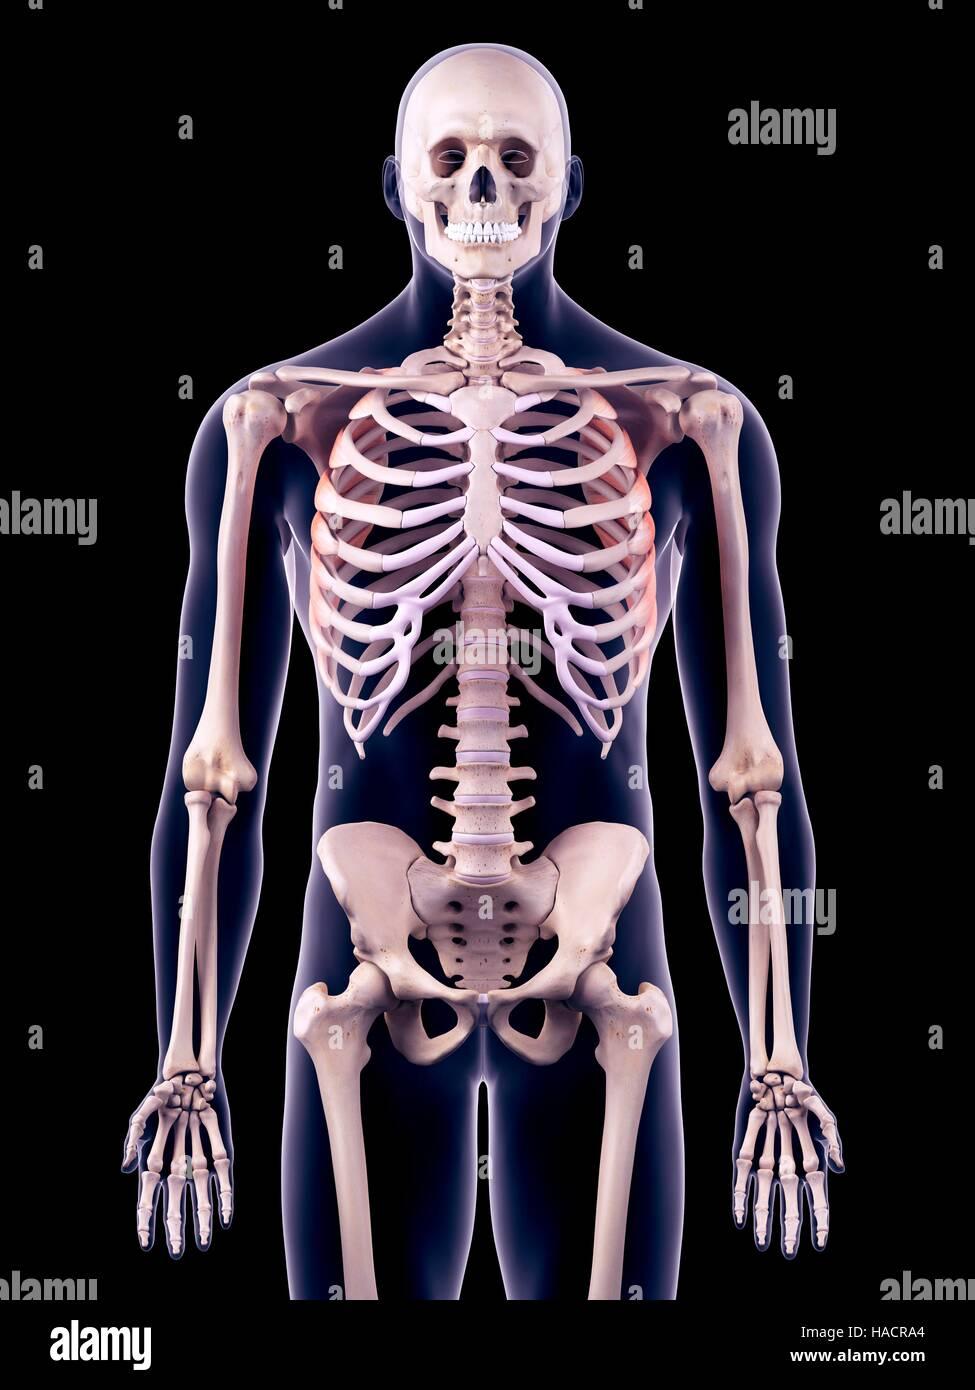 Illustration of the serratus anterior muscles. - Stock Image